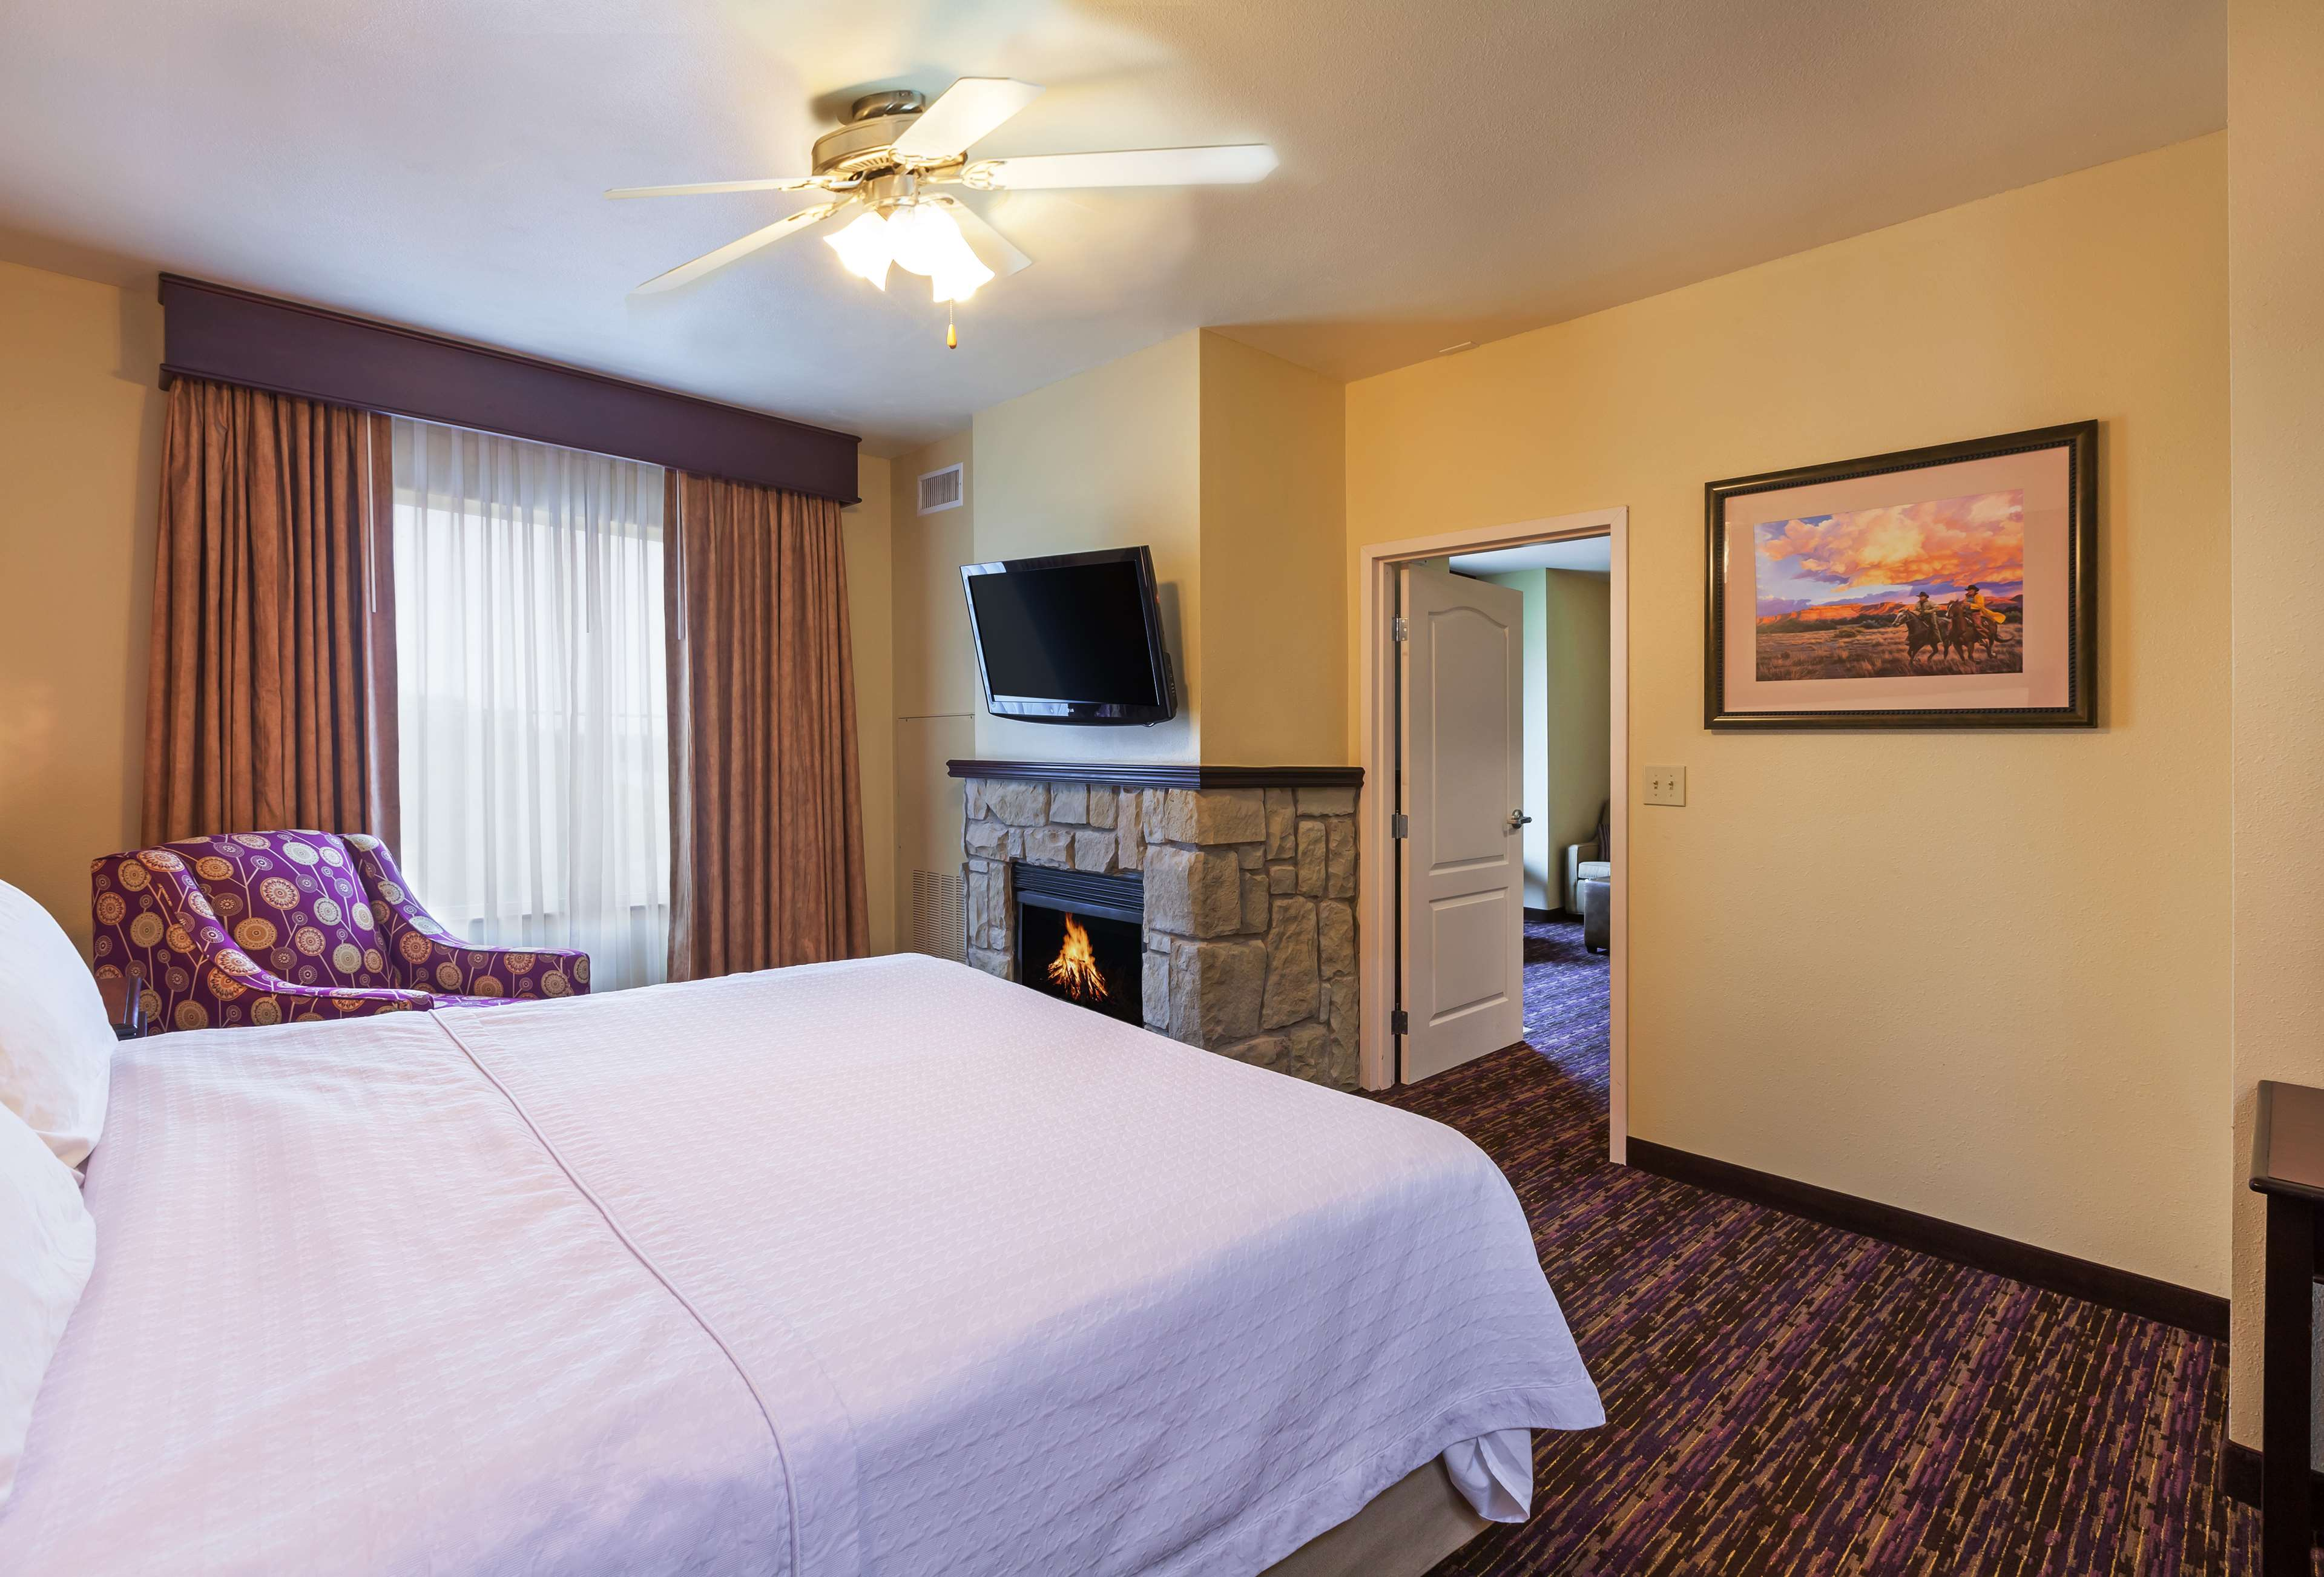 Homewood Suites by Hilton Wichita Falls image 20